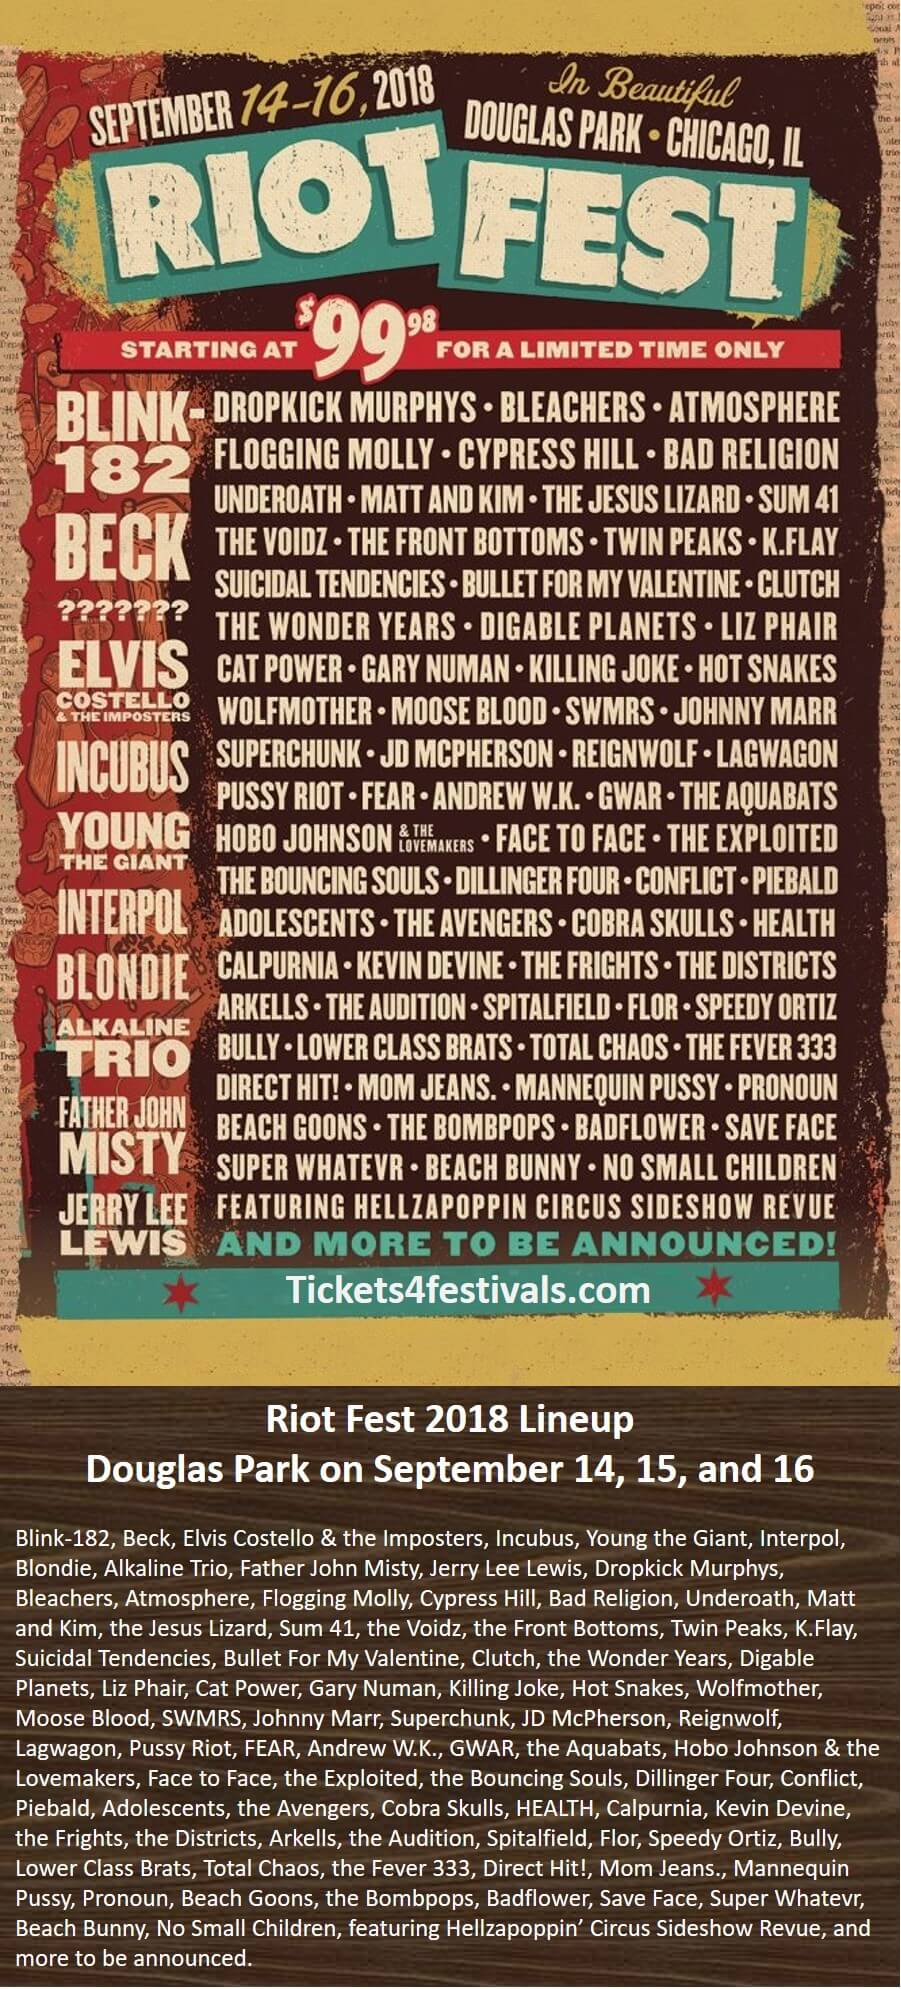 Riot Fest Chicago 2018 LineUp